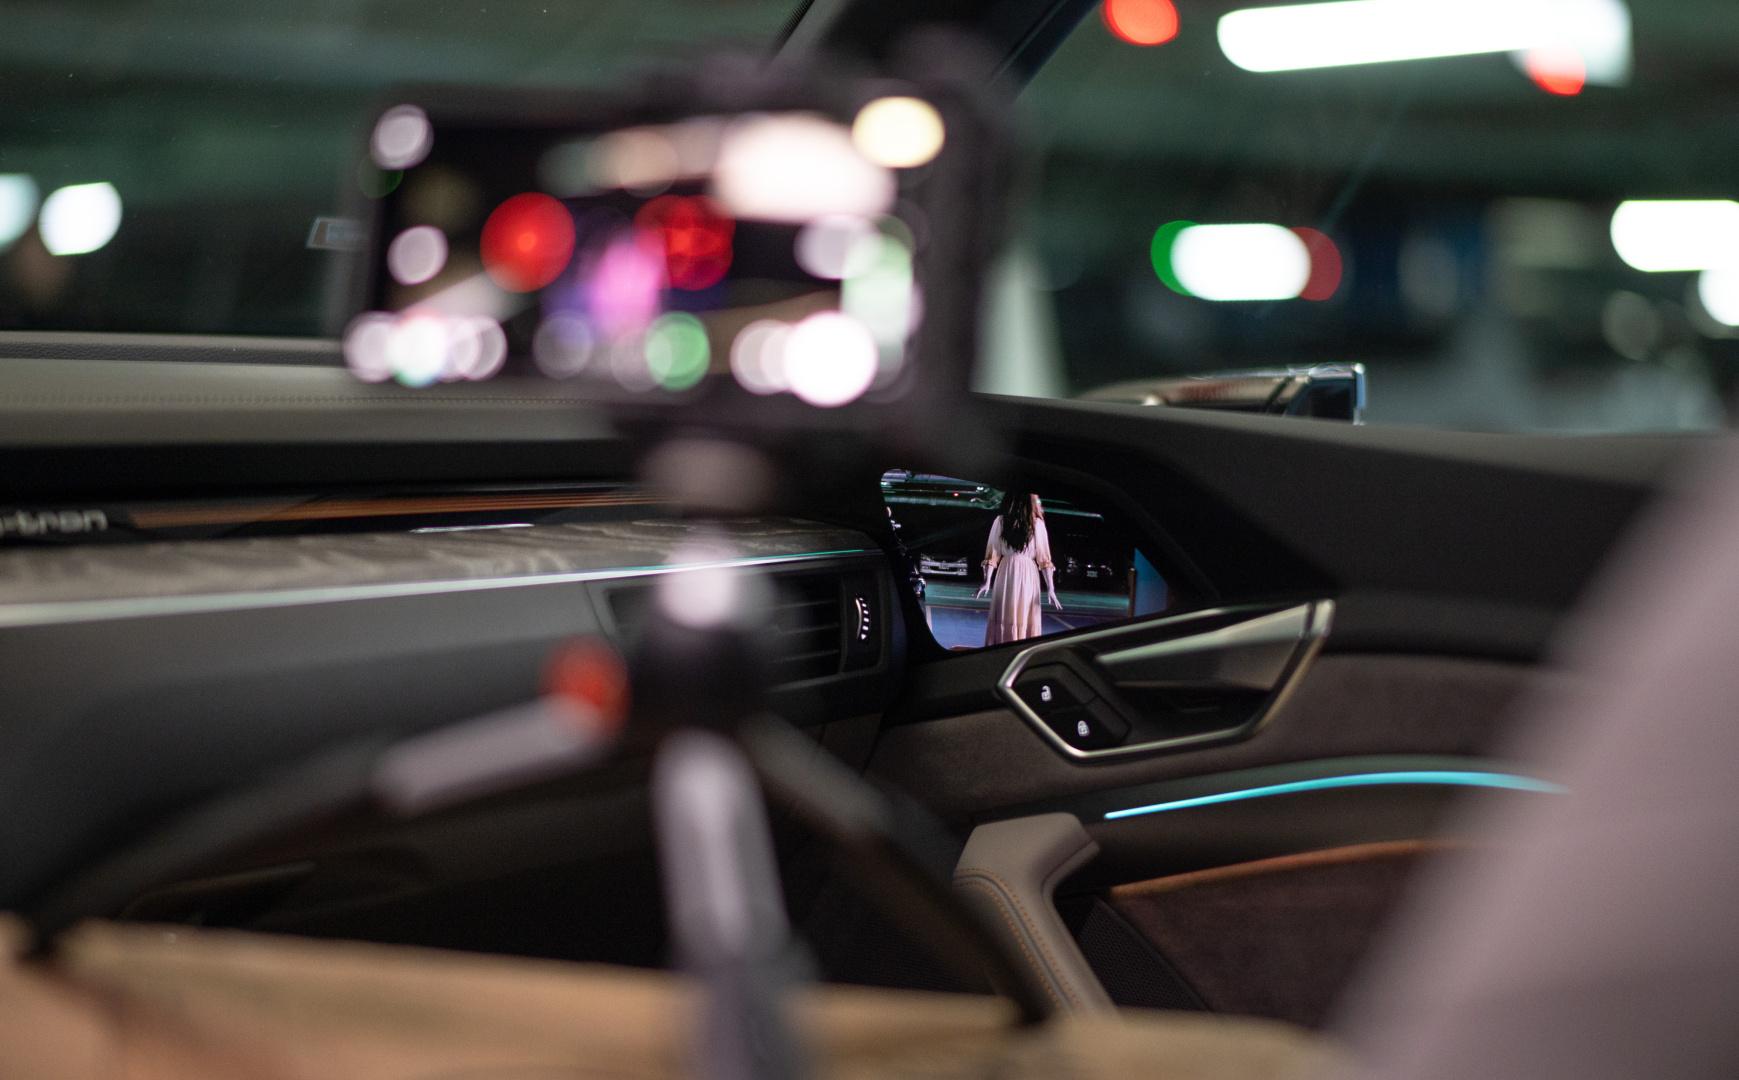 SMALL_Audi虛擬後視鏡倒映出影片中的神秘角色